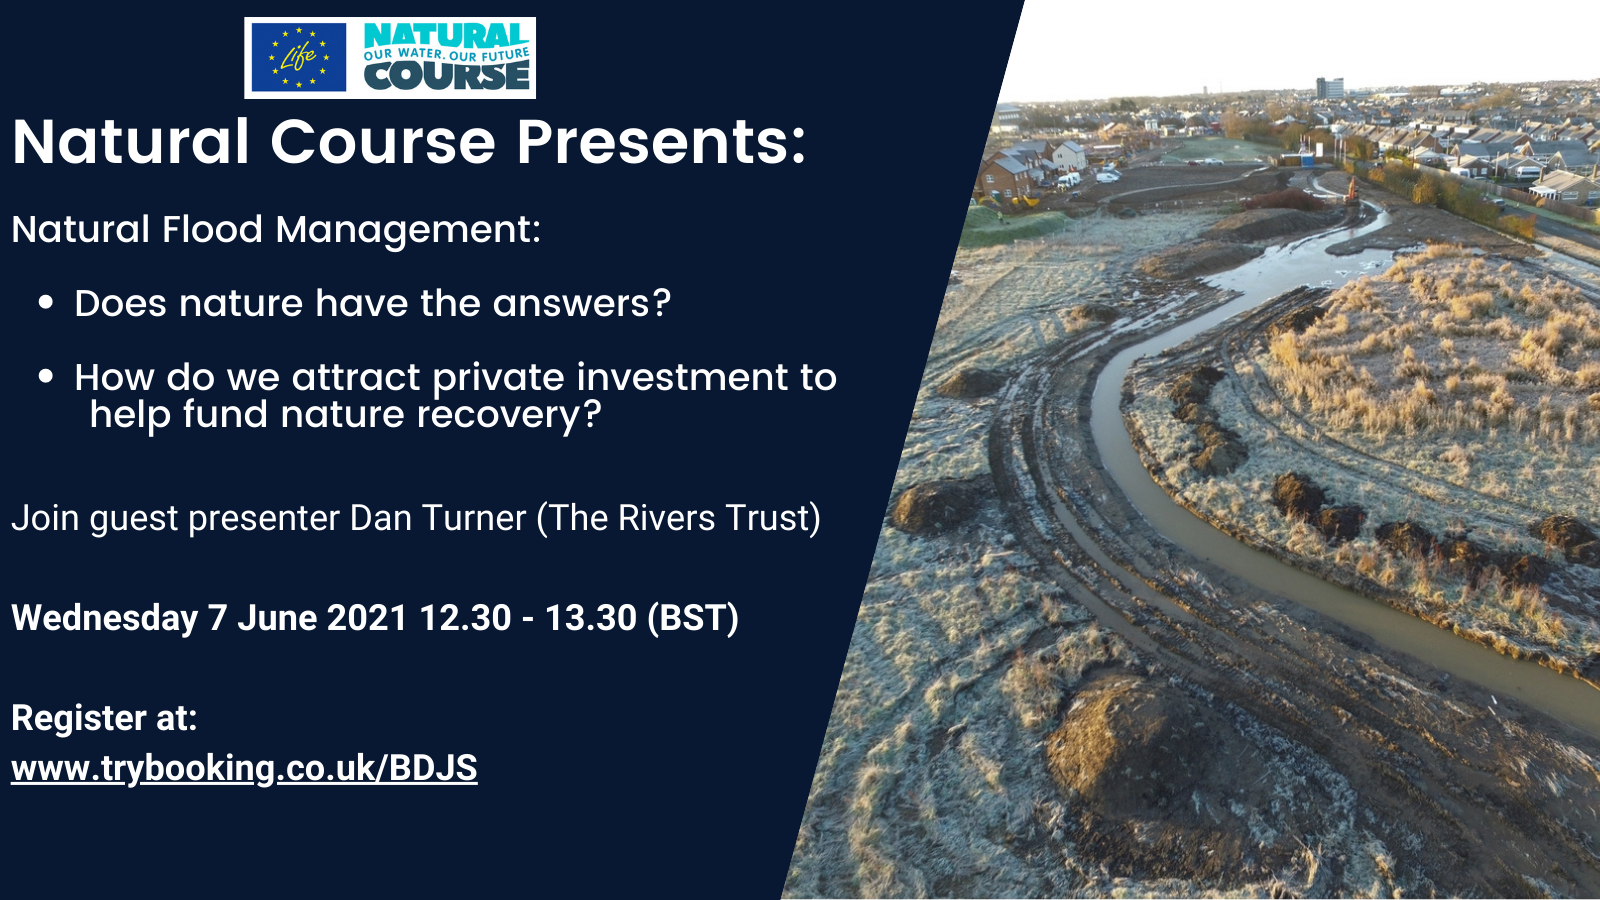 Natural Course Presents: Natural Flood Management